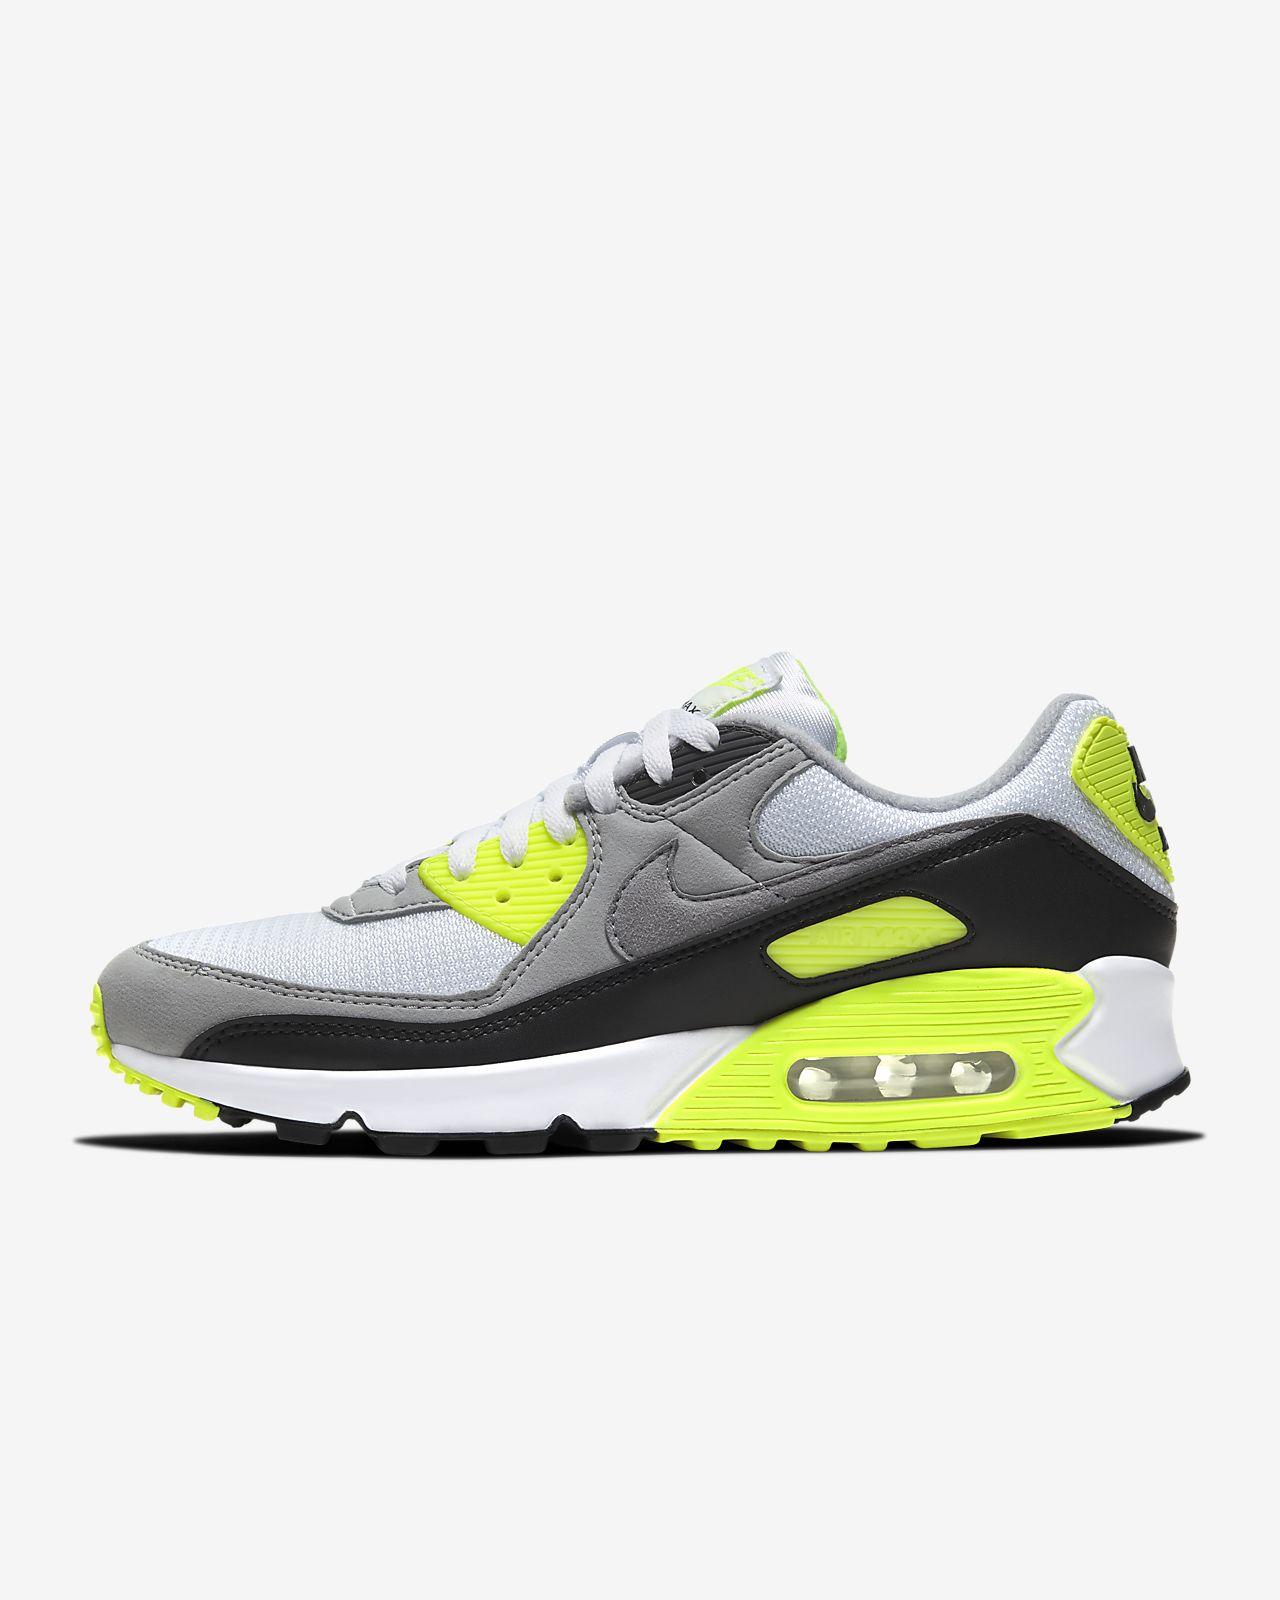 Nike Air Max 90 男子运动鞋